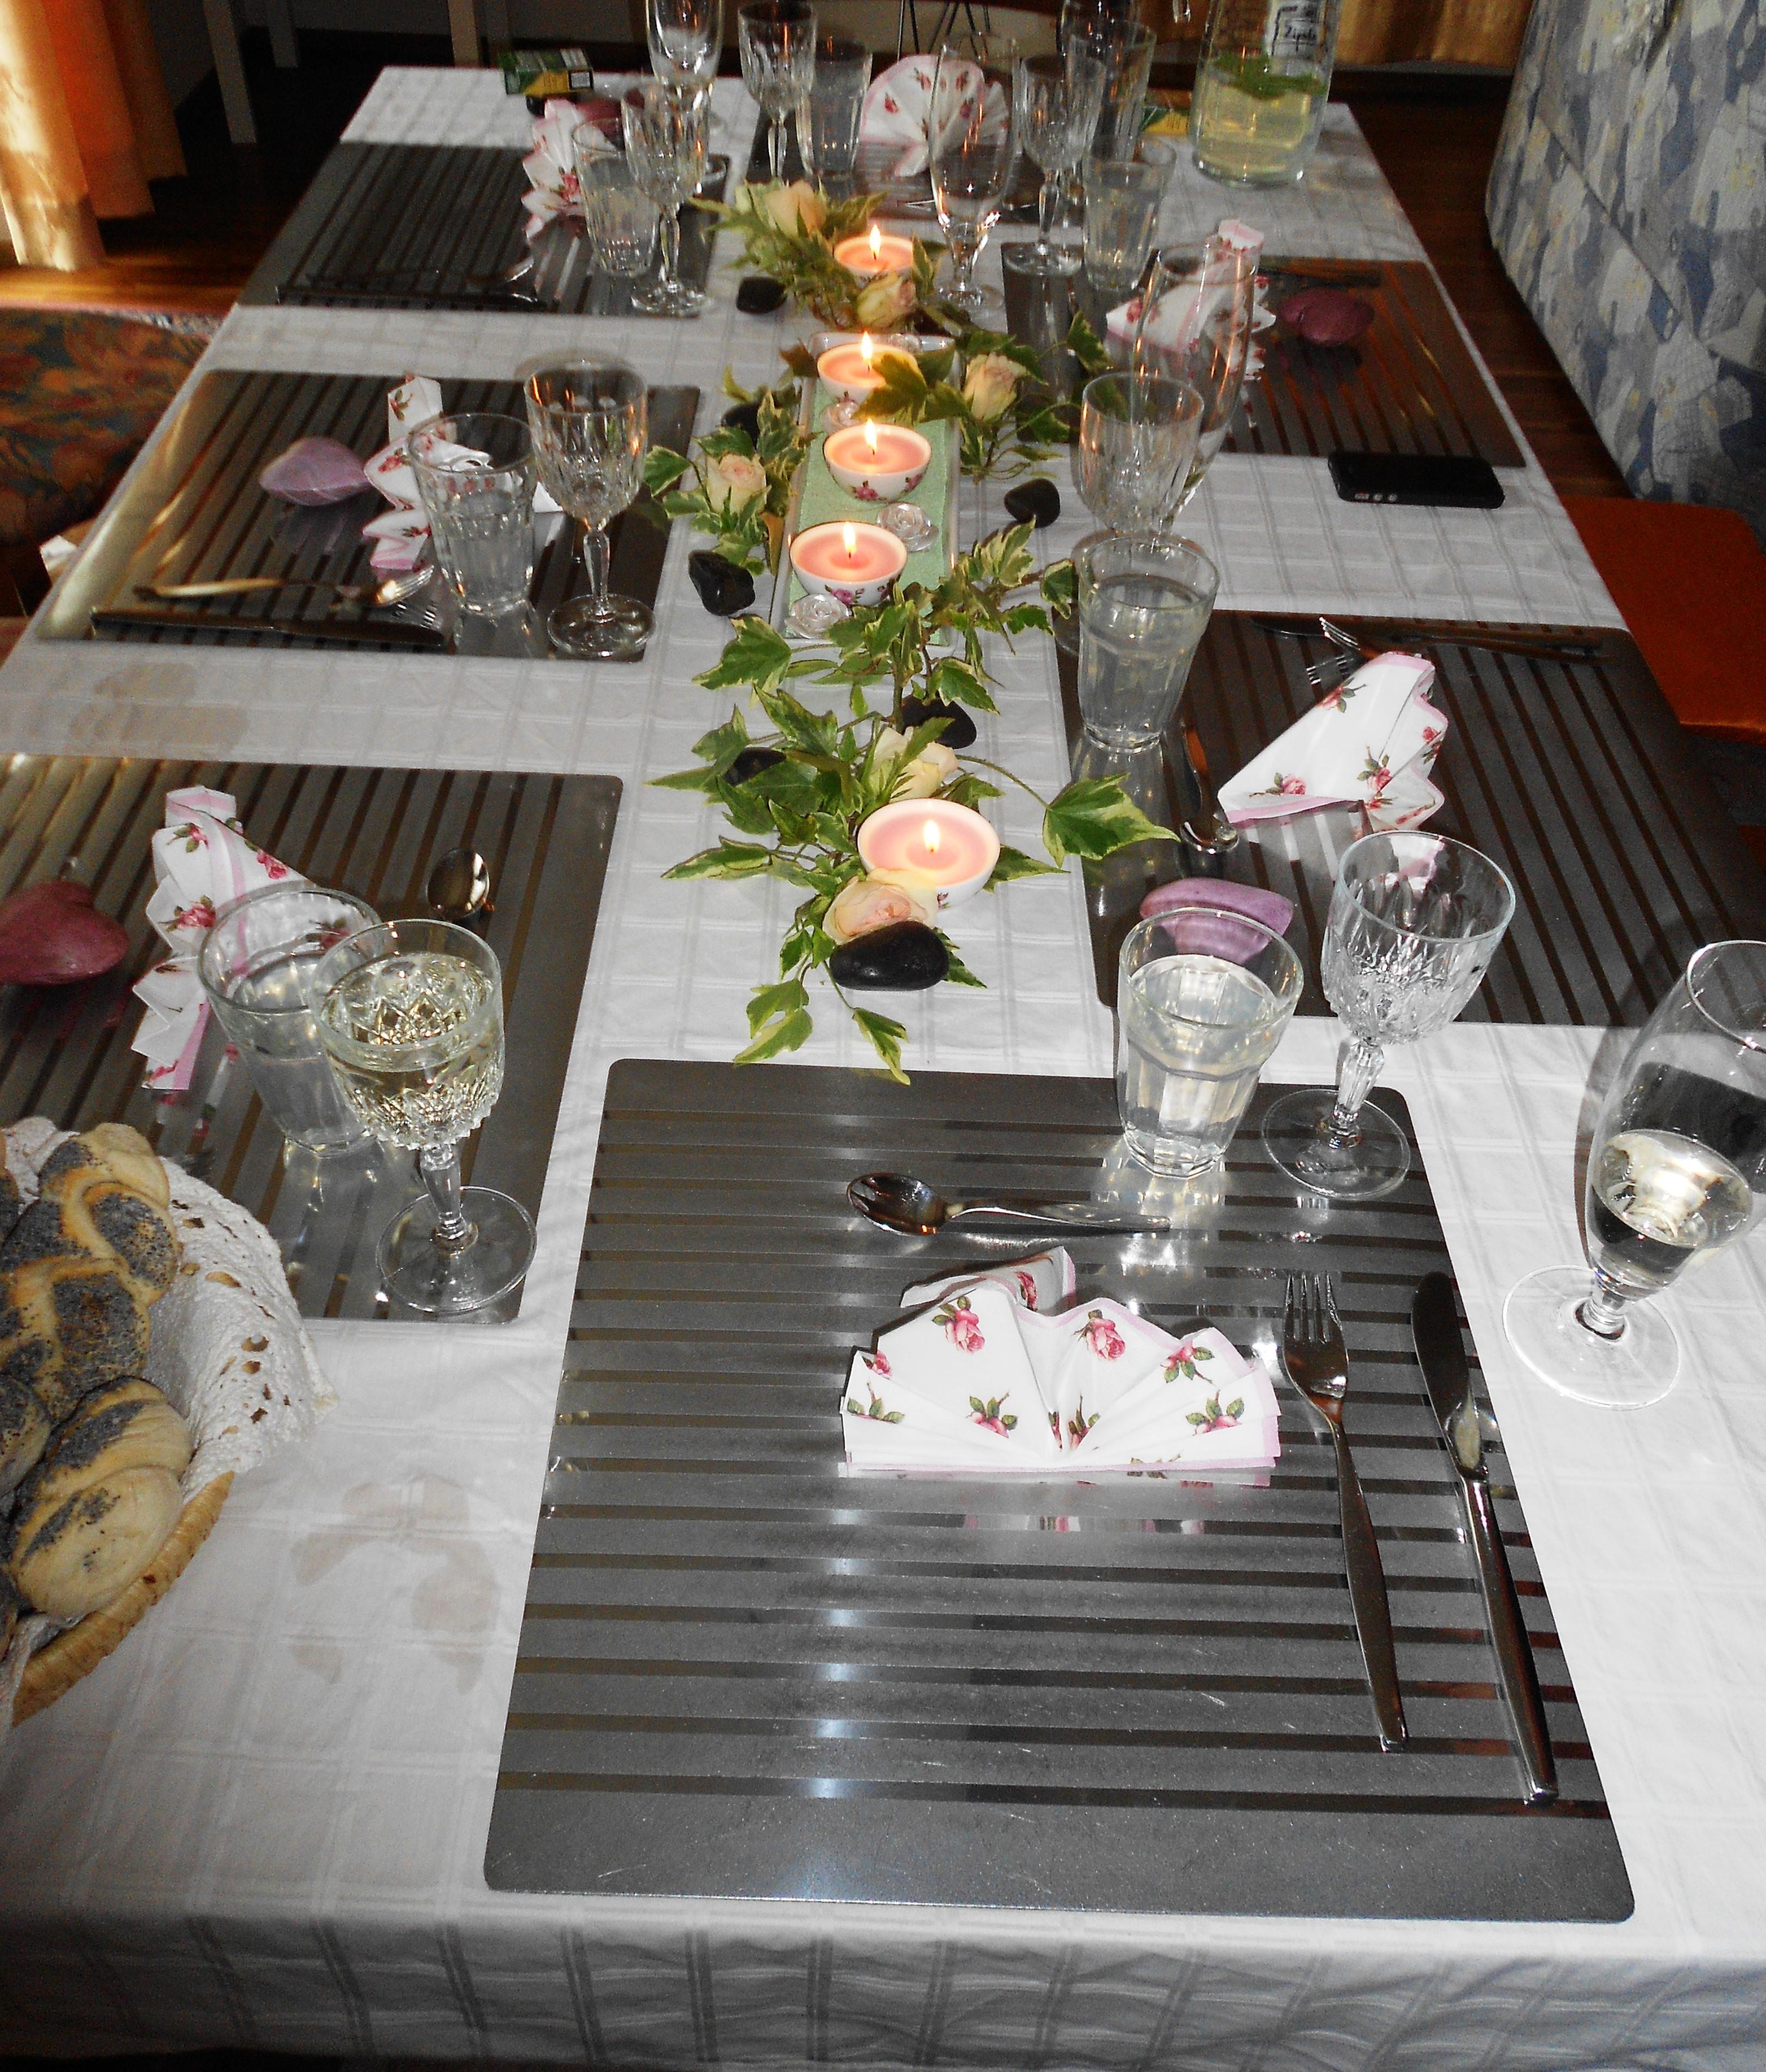 Tischdeko Brunch Feste And Feiern Decoration And Dinner